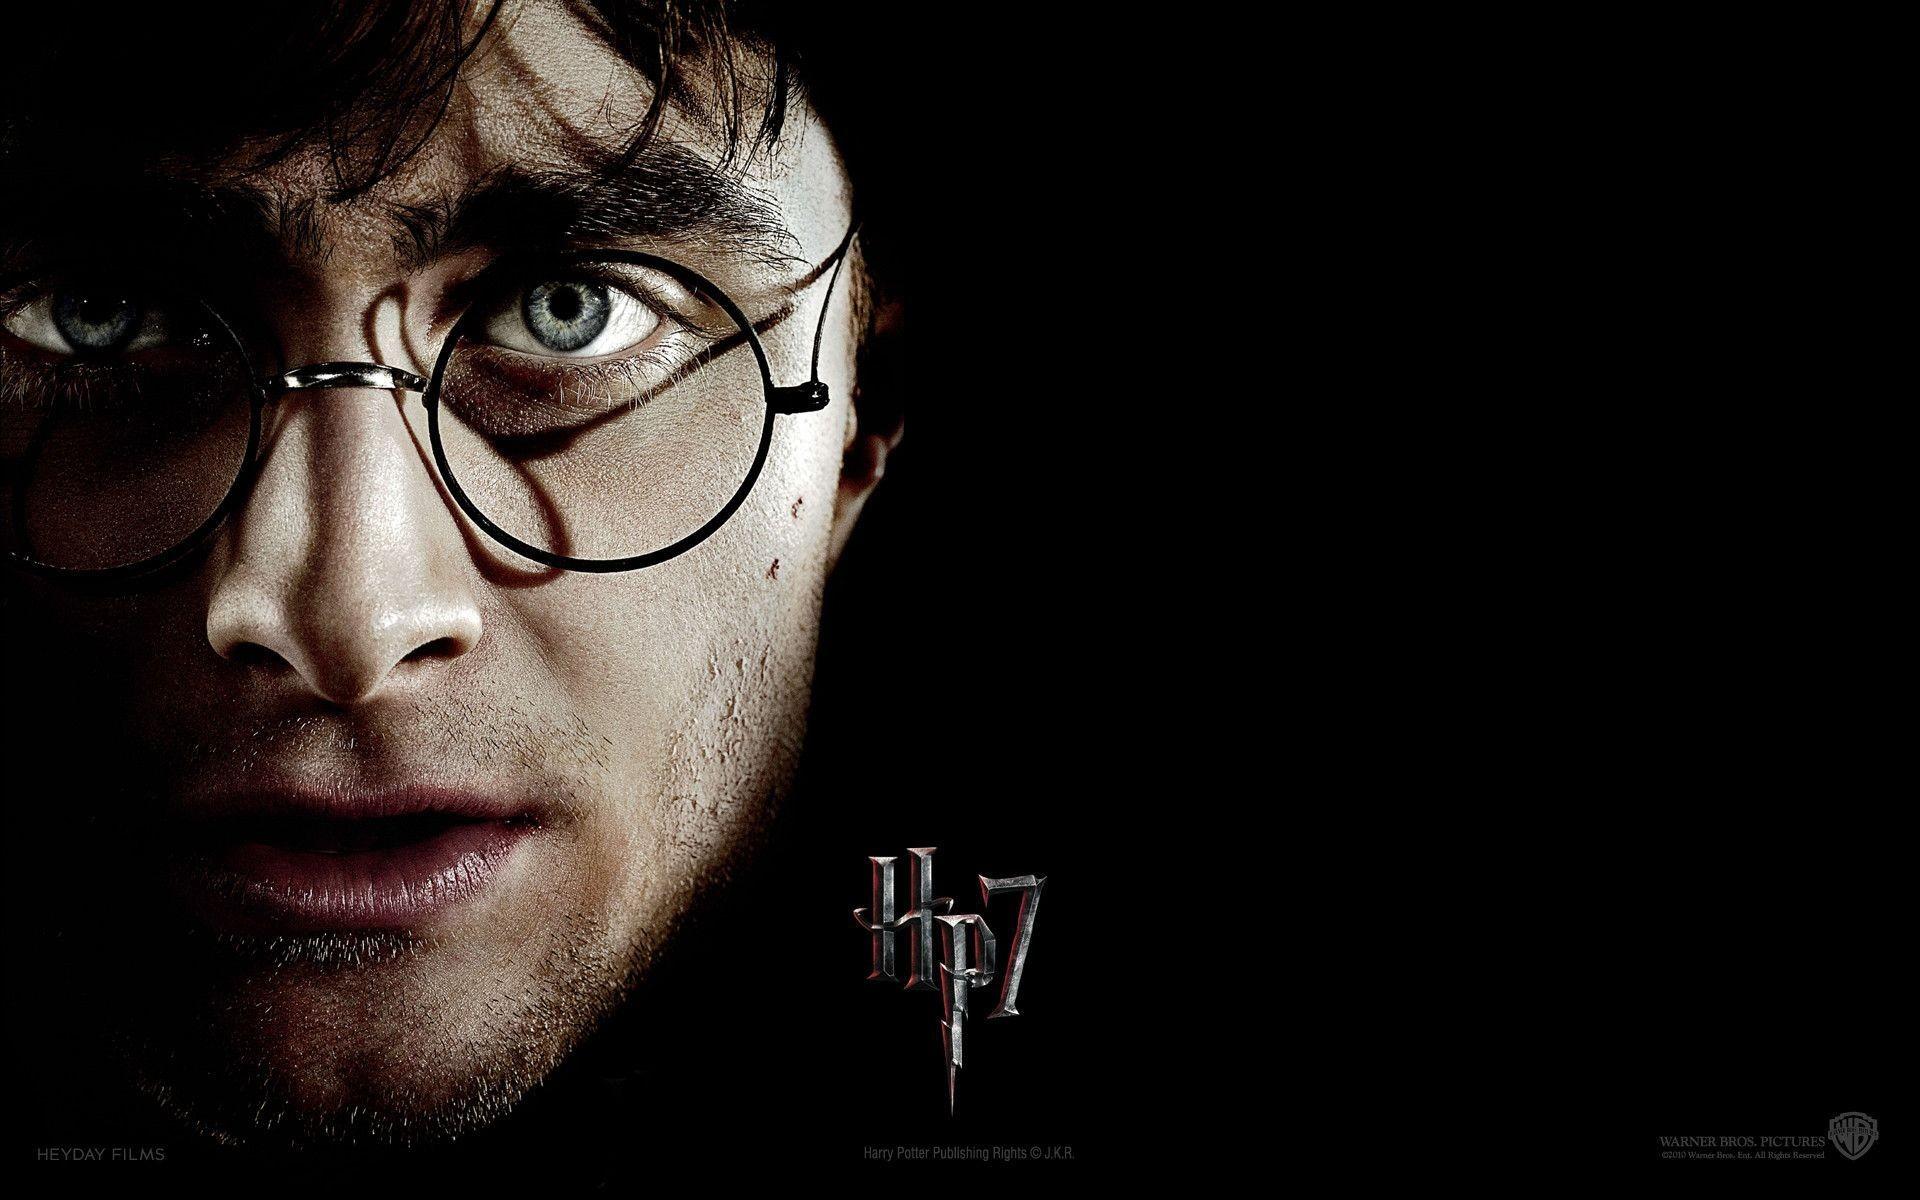 best ideas about Harry Potter Wallpaper on Pinterest Harry